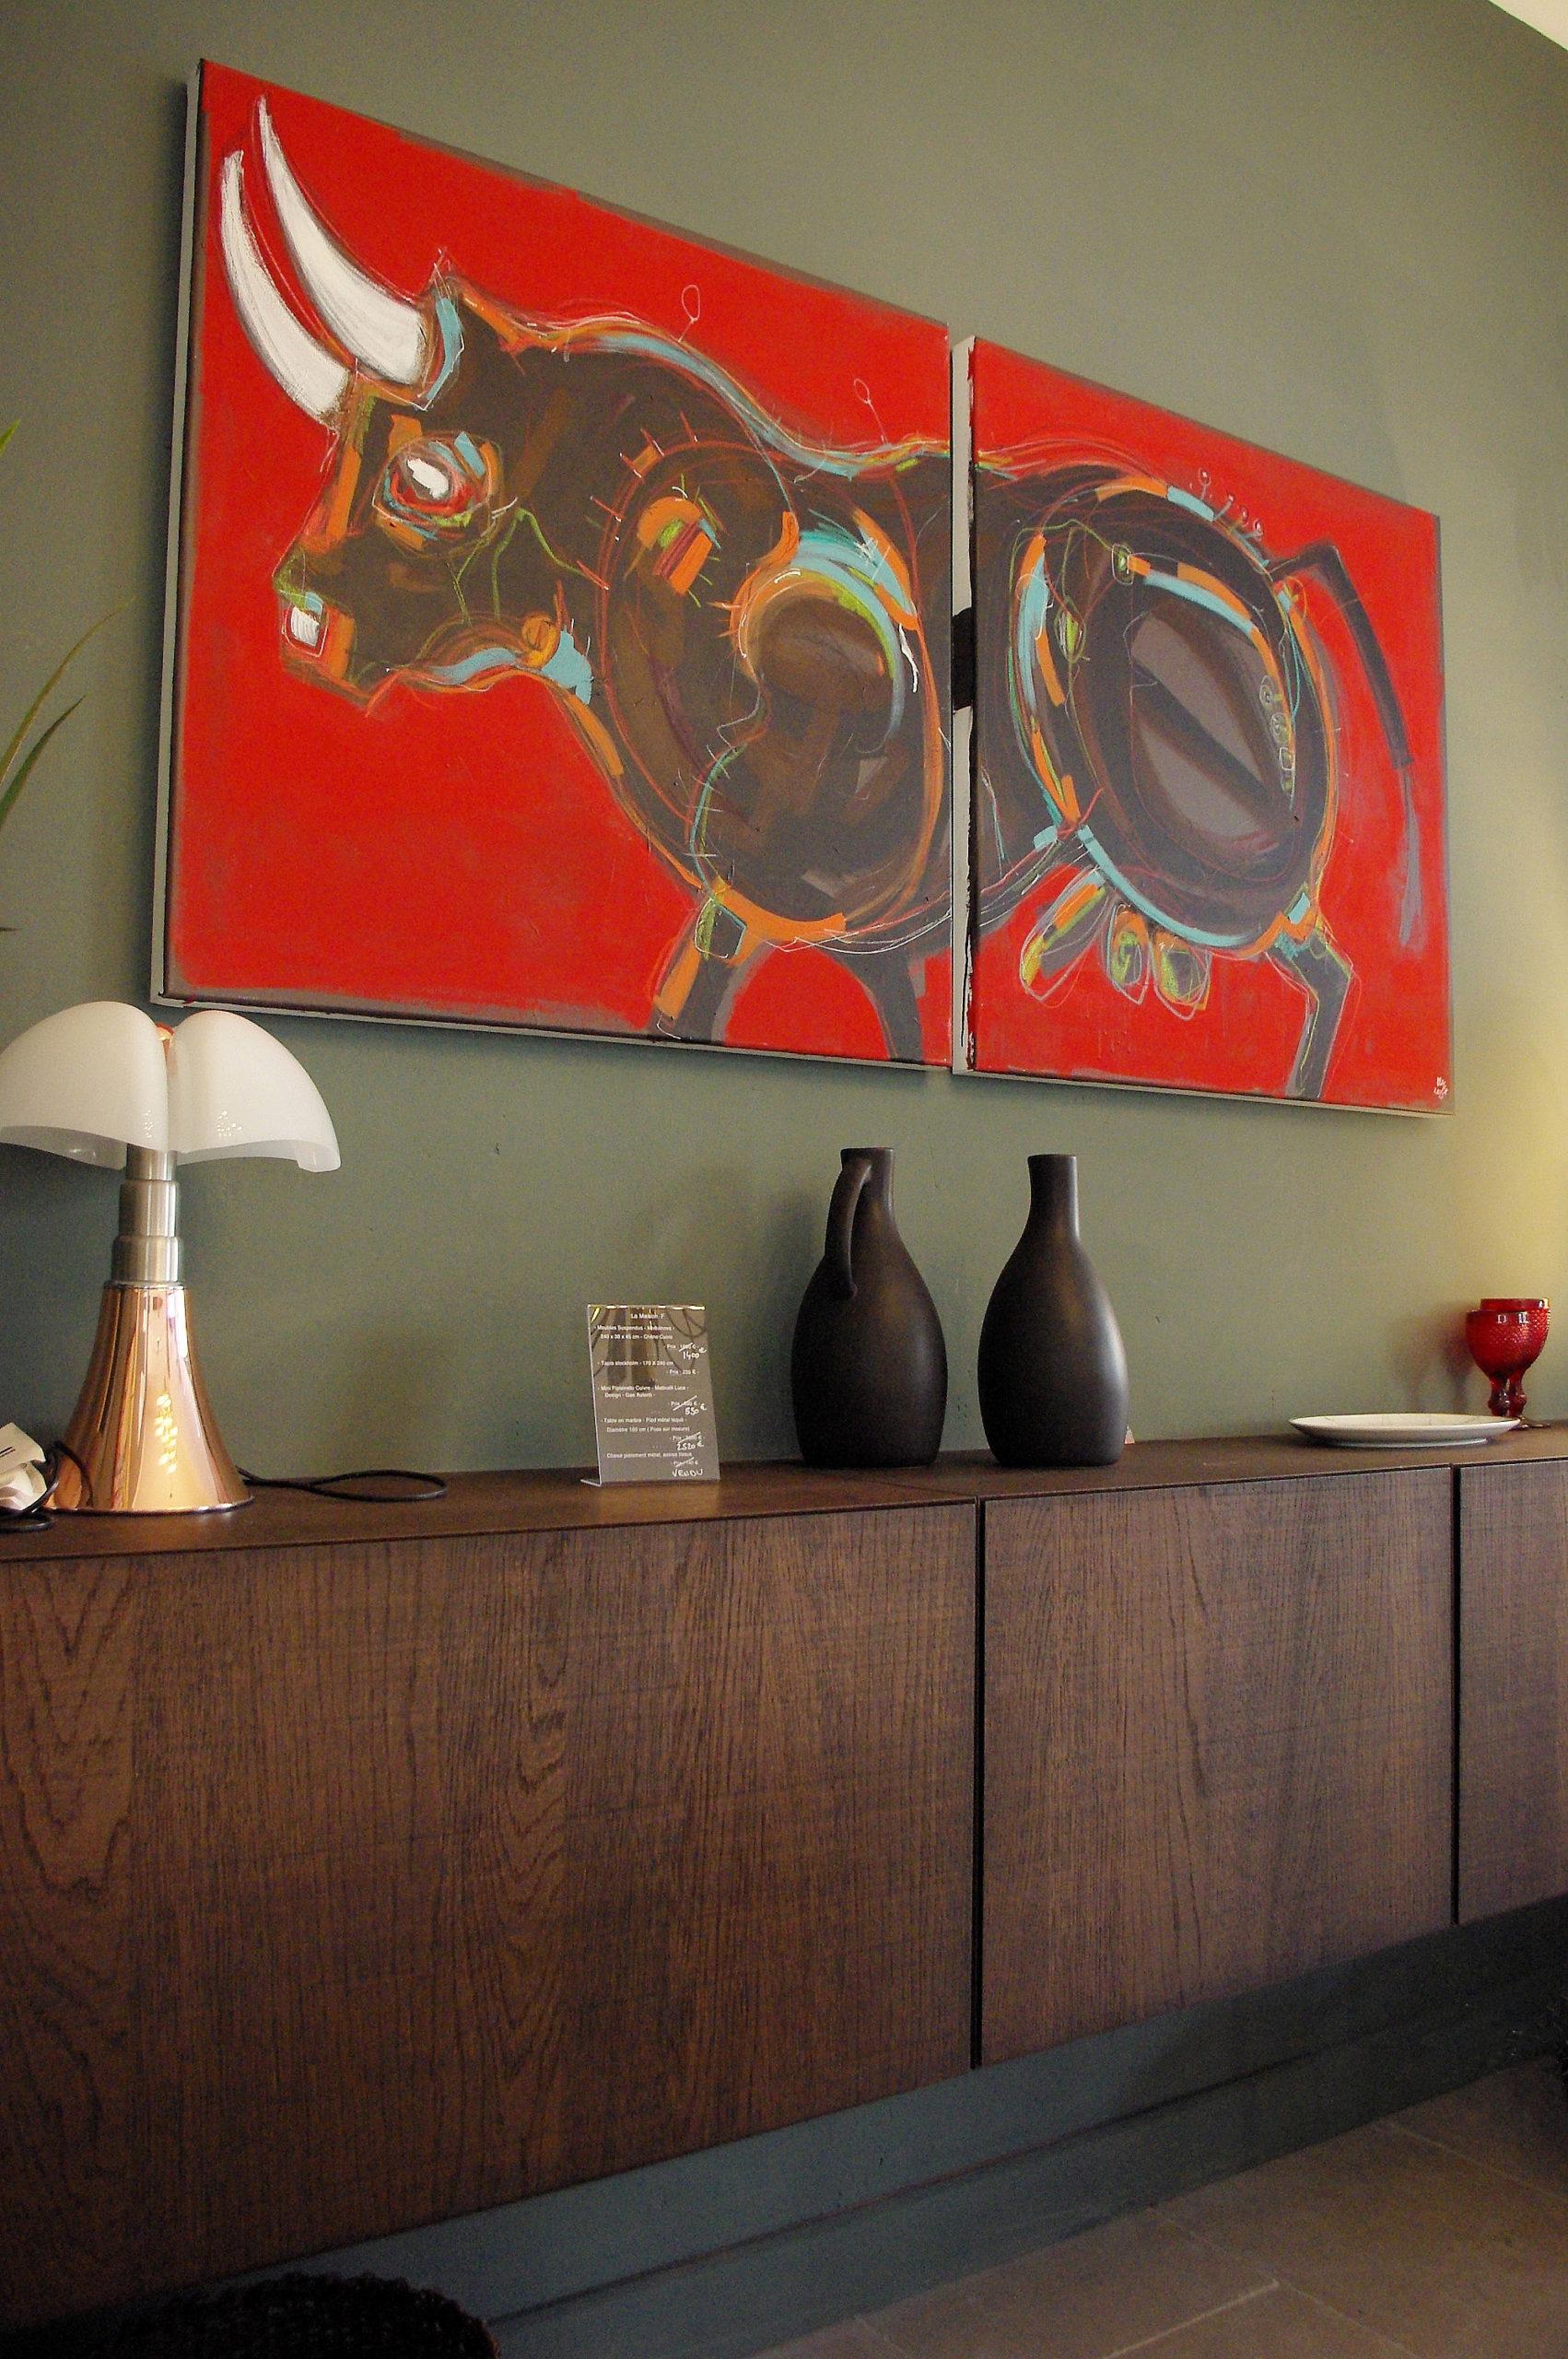 https://amelie-bouchez.fr/wp-content/uploads/2020/11/amelie-bouchez-showroom-decoration-stremydeprovence-1-scaled.jpg